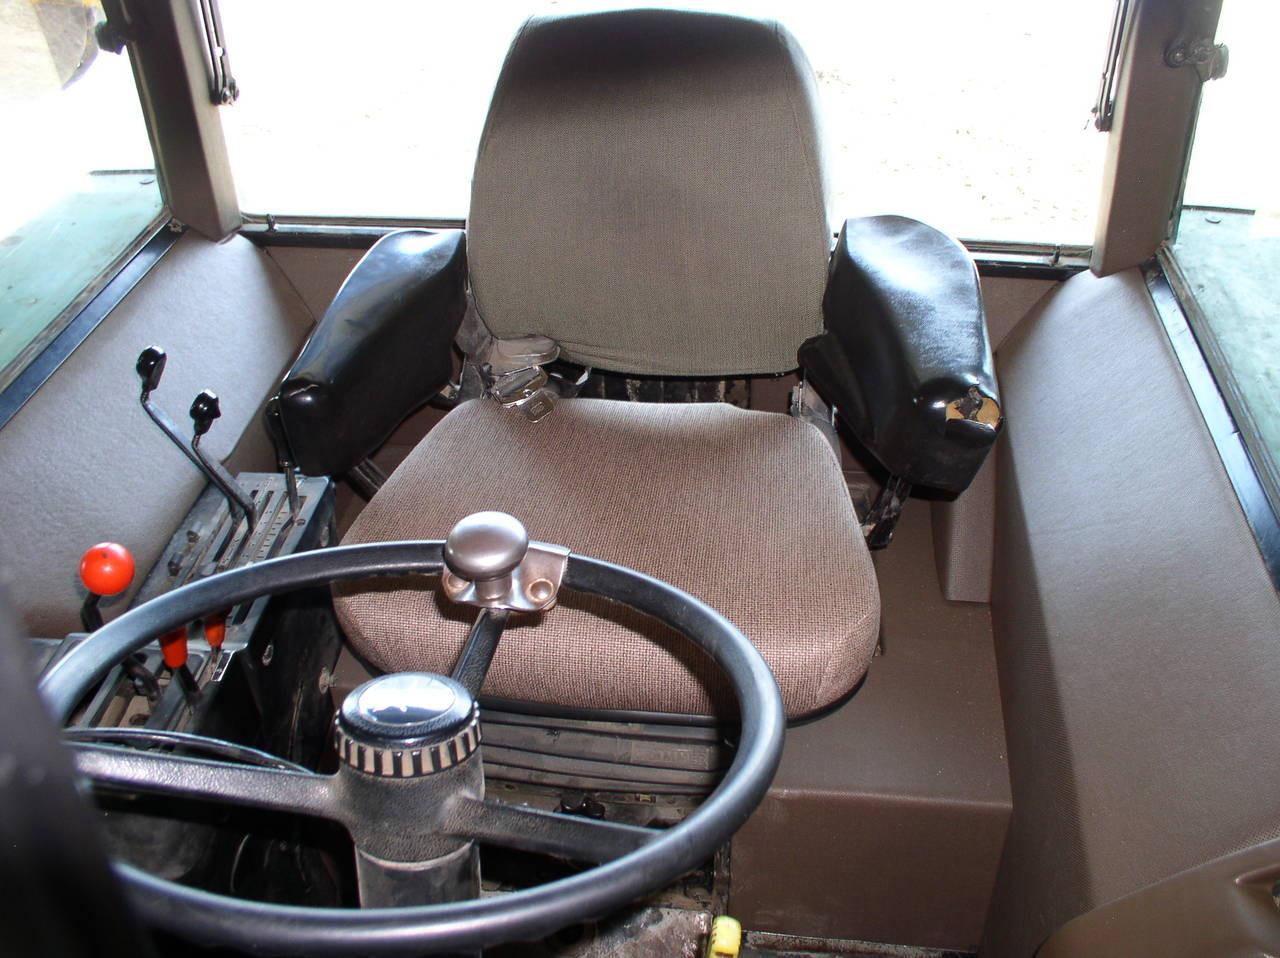 jd 2950 wiring diagram omc cobra wiring diagram 2950 John Deere Transmission Diagram  John Deere 330 Garden Tractor Wiring Diagram 2140 John Deere Diagram John Deere Engine Wiring Diagram